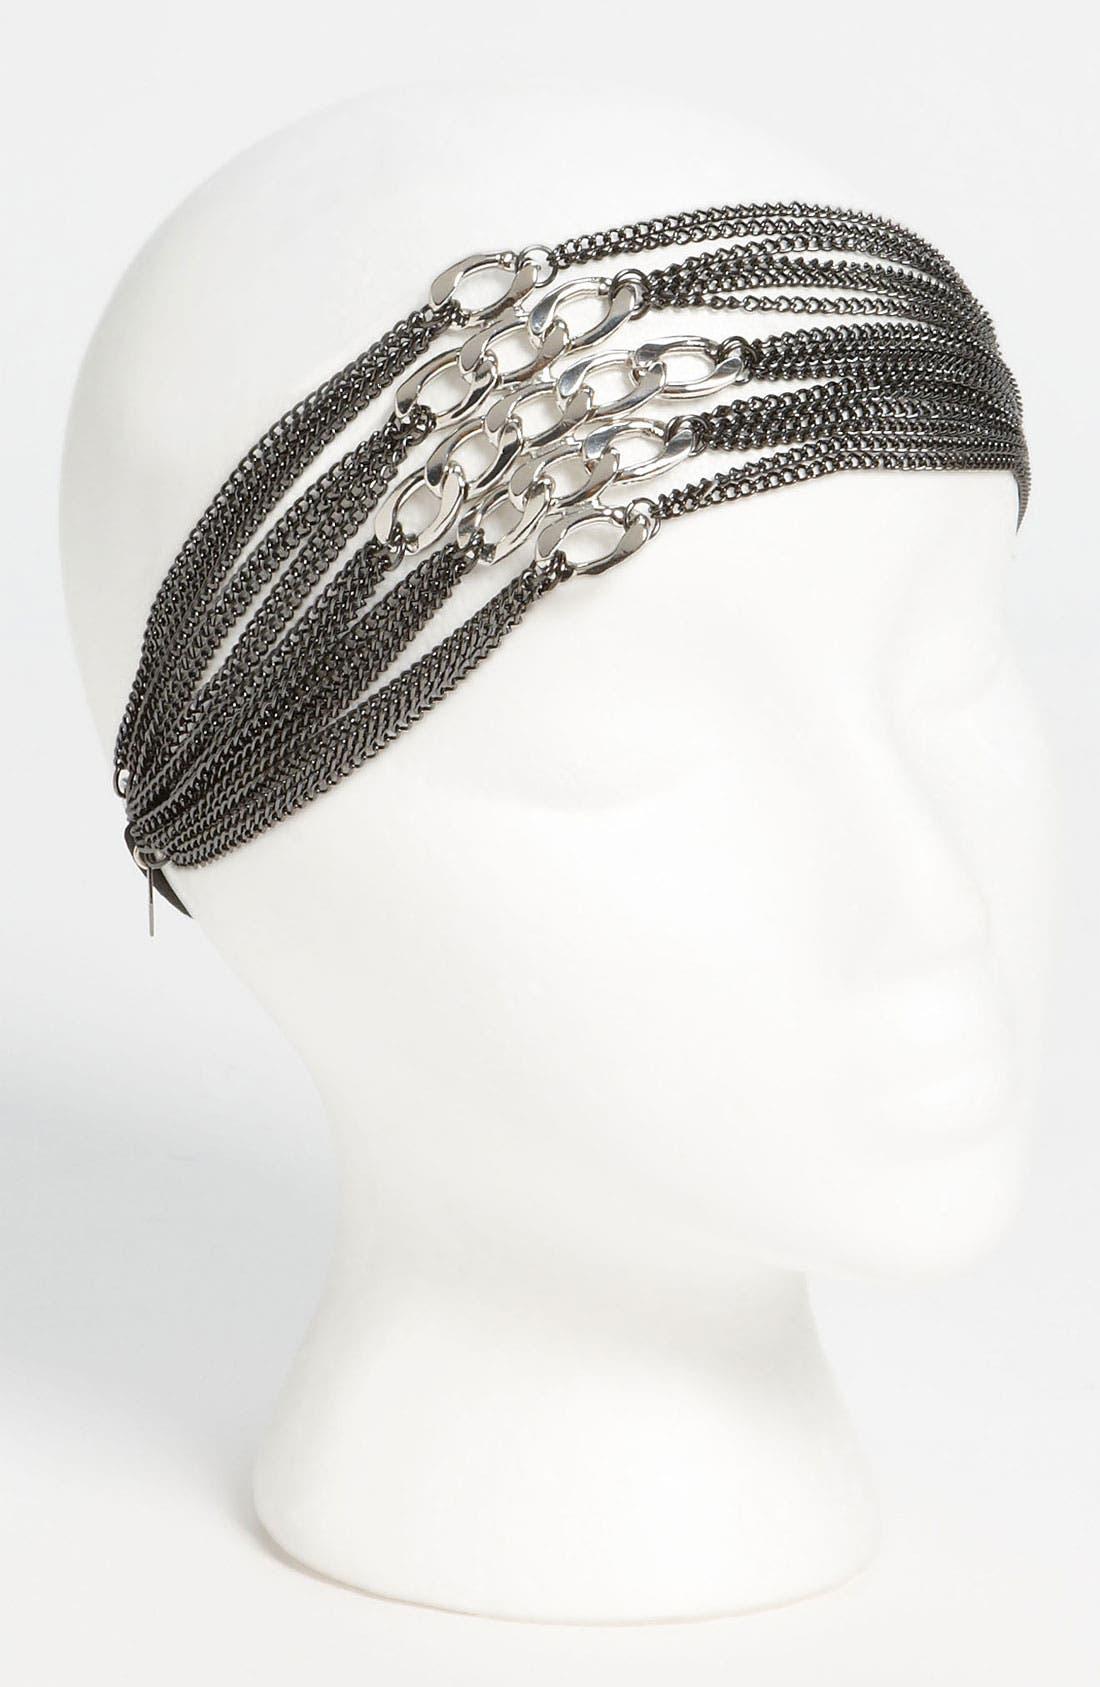 Alternate Image 1 Selected - Tasha 'Trillions of Chains' Head Wrap